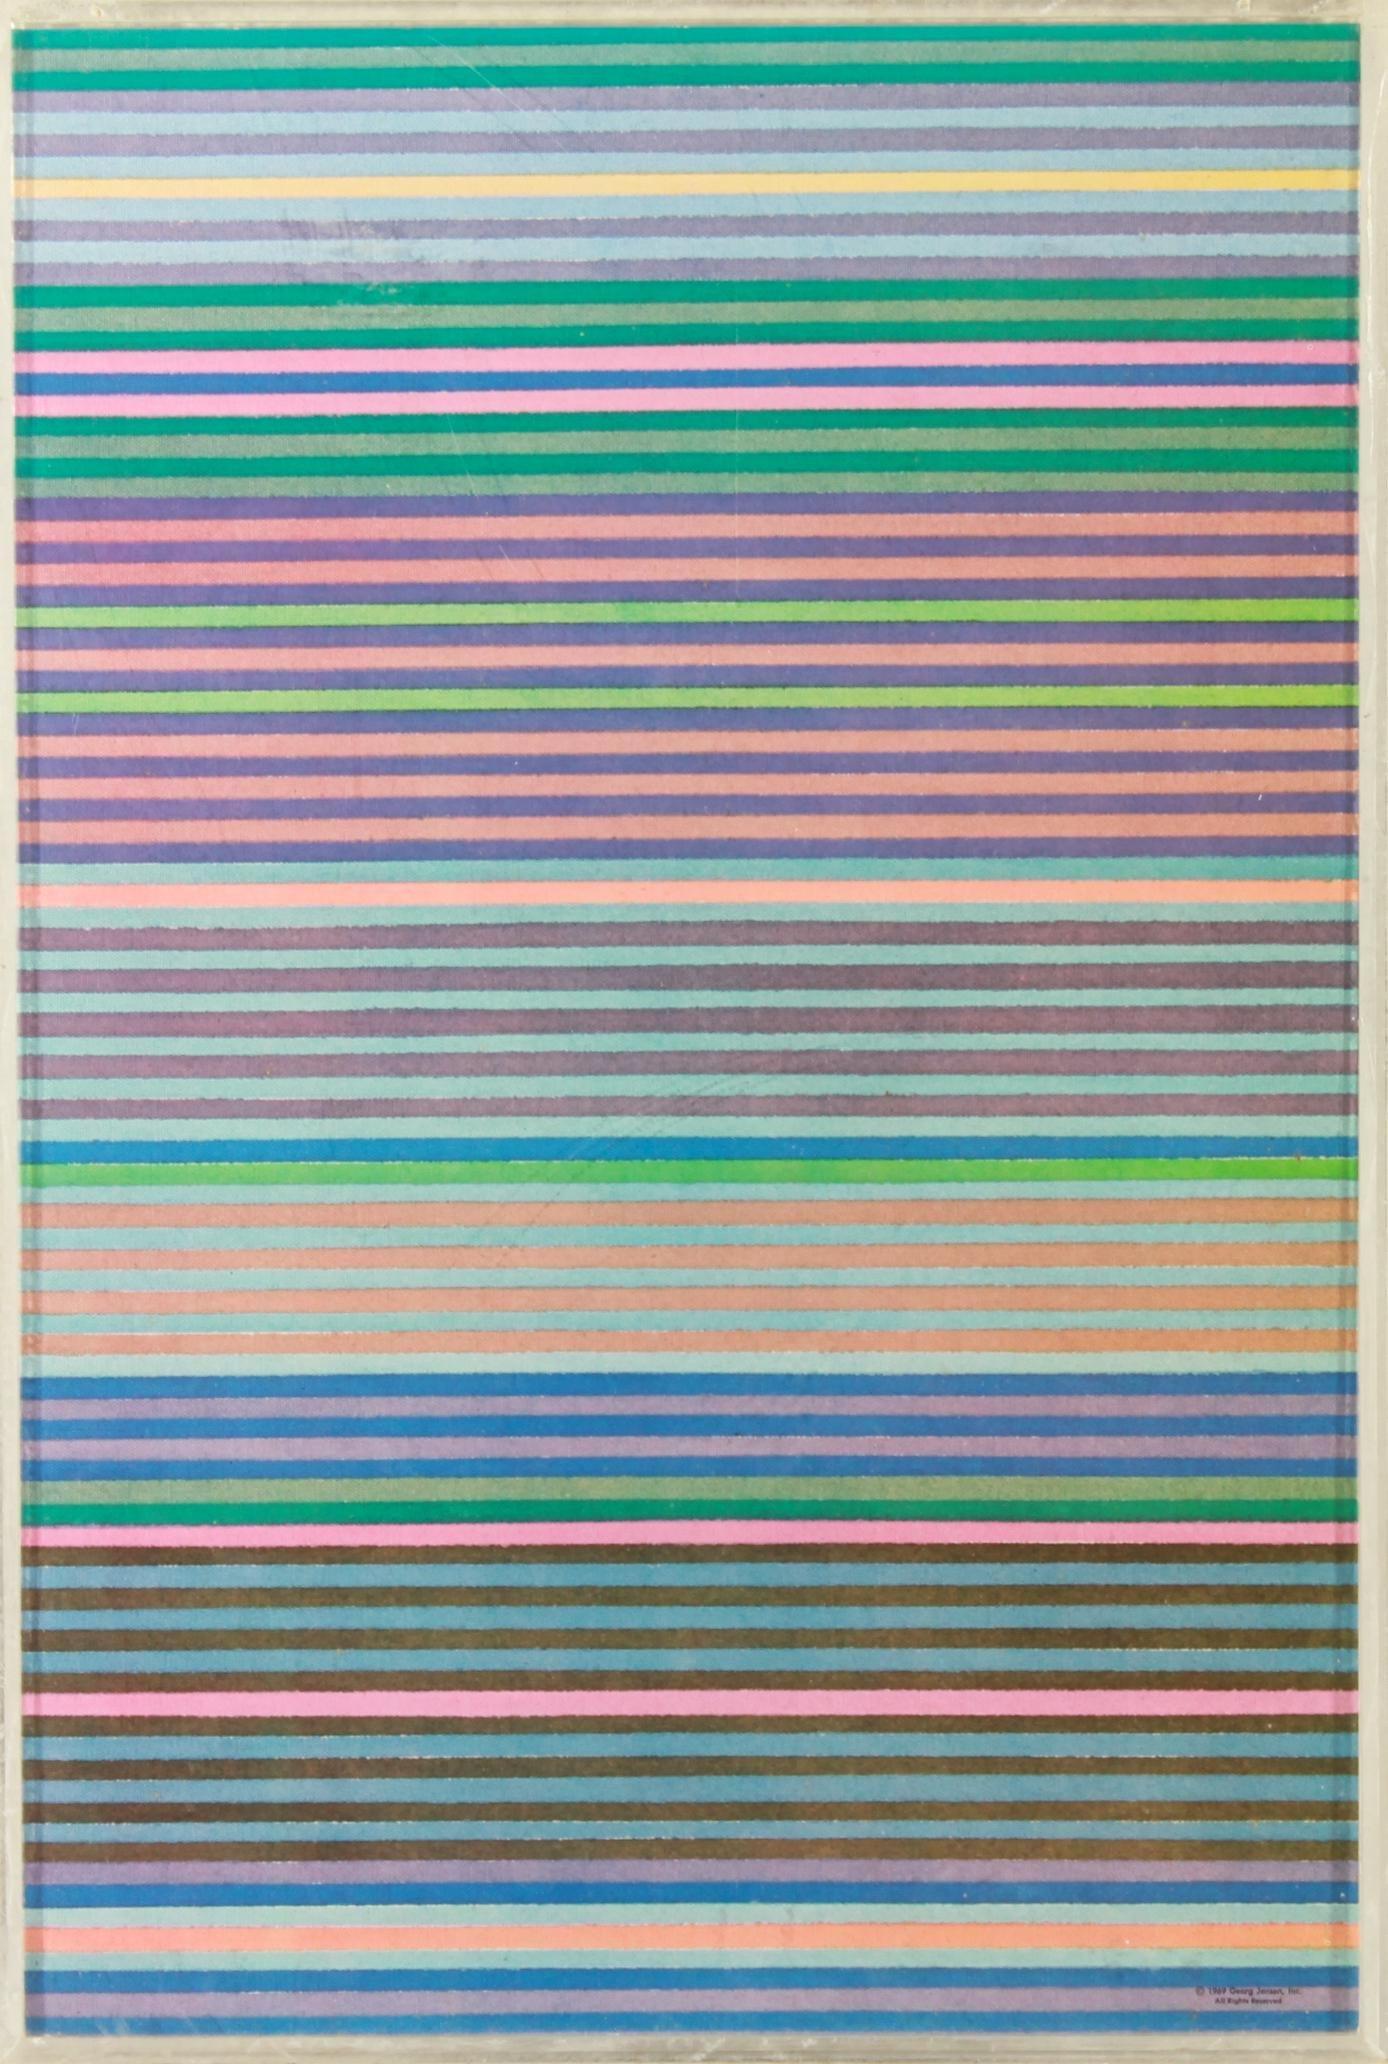 Gene Davis for Georg Jensen Art Puzzle 1969